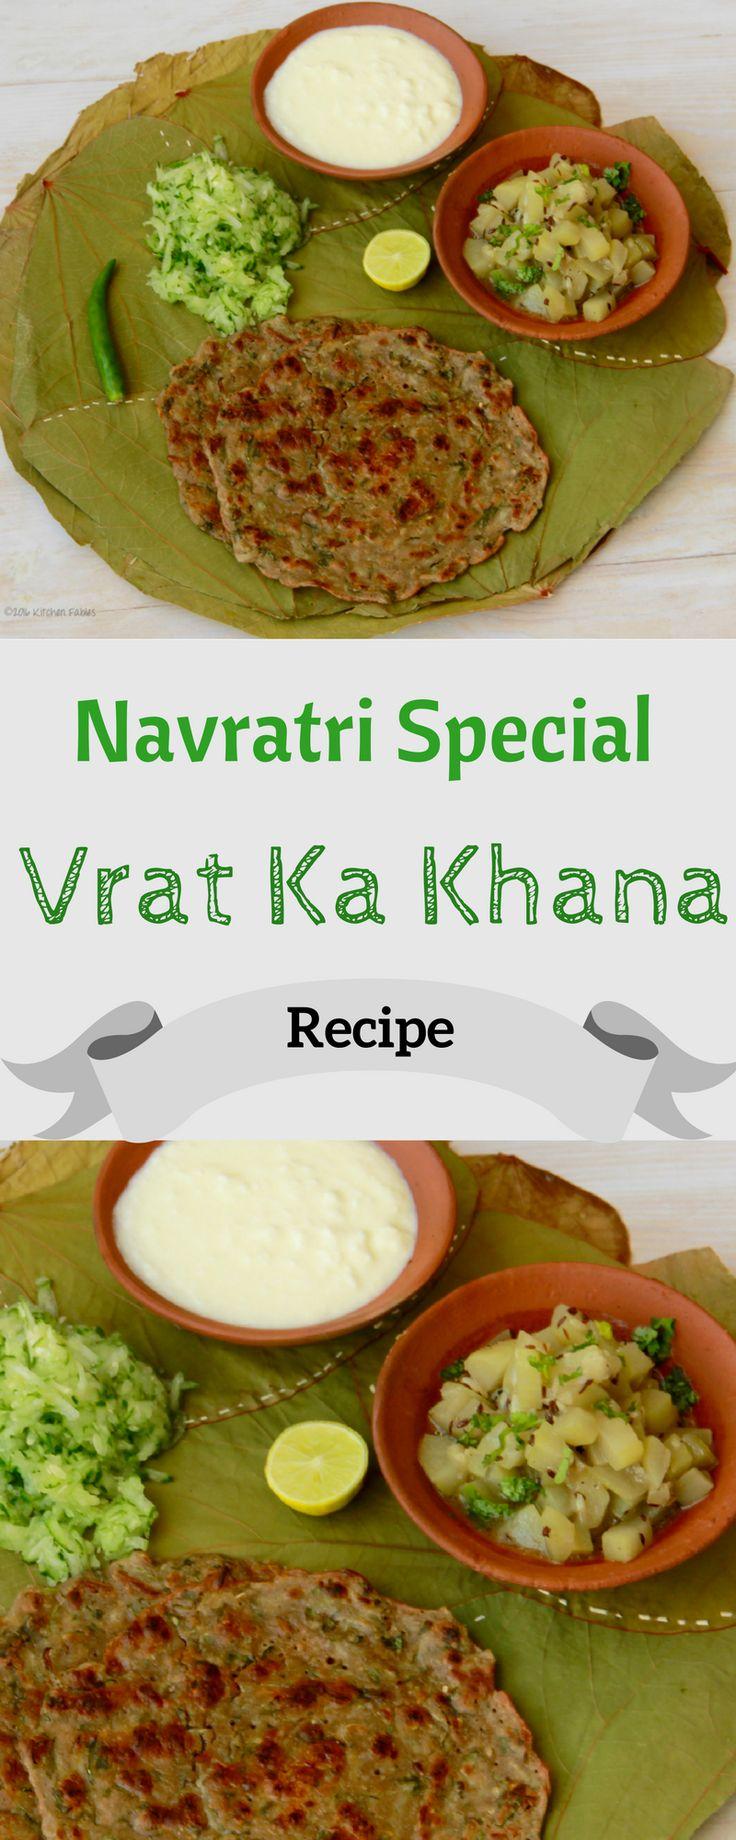 A quick and easy recipe for Kuttu ka chilla and lauki ki sabzi ( Buckwheat Flour pancakes and & Bottle gourd side dish ). Dussehra/Navaratri Vrat Recipe.